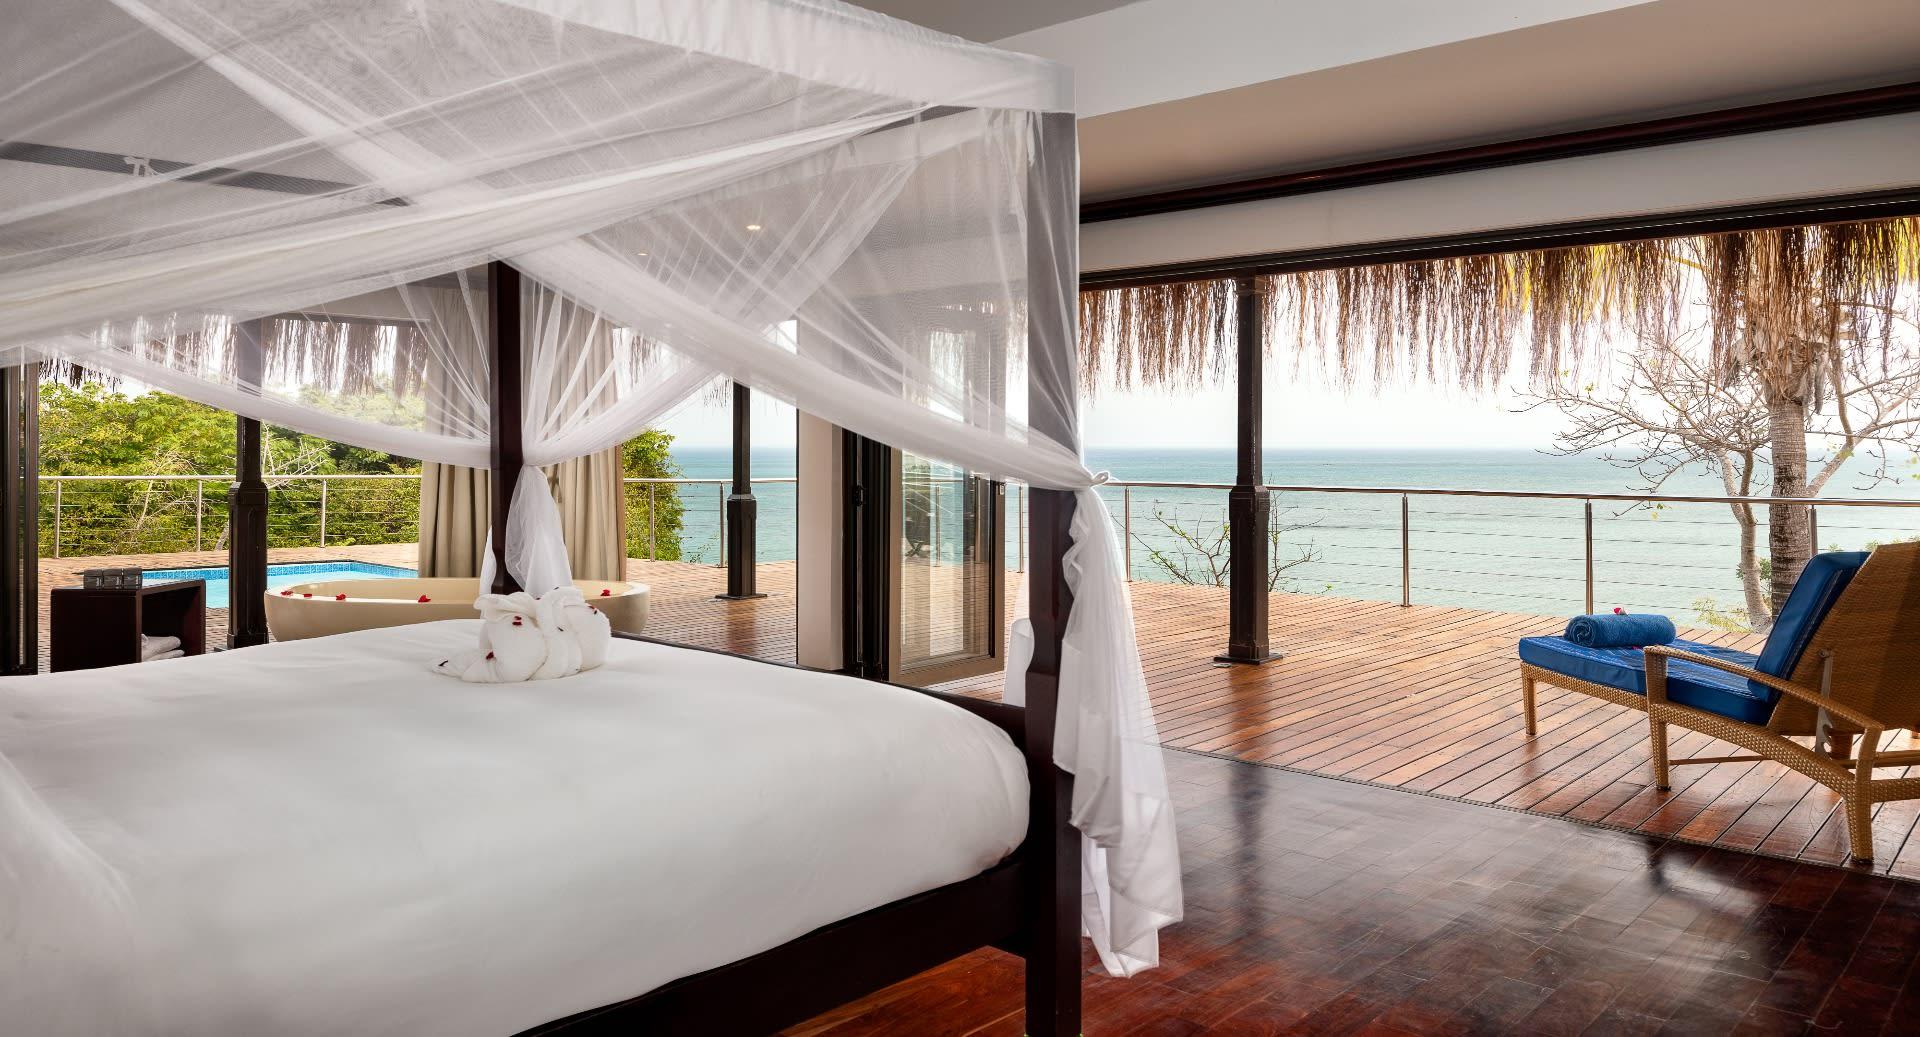 Image of resort